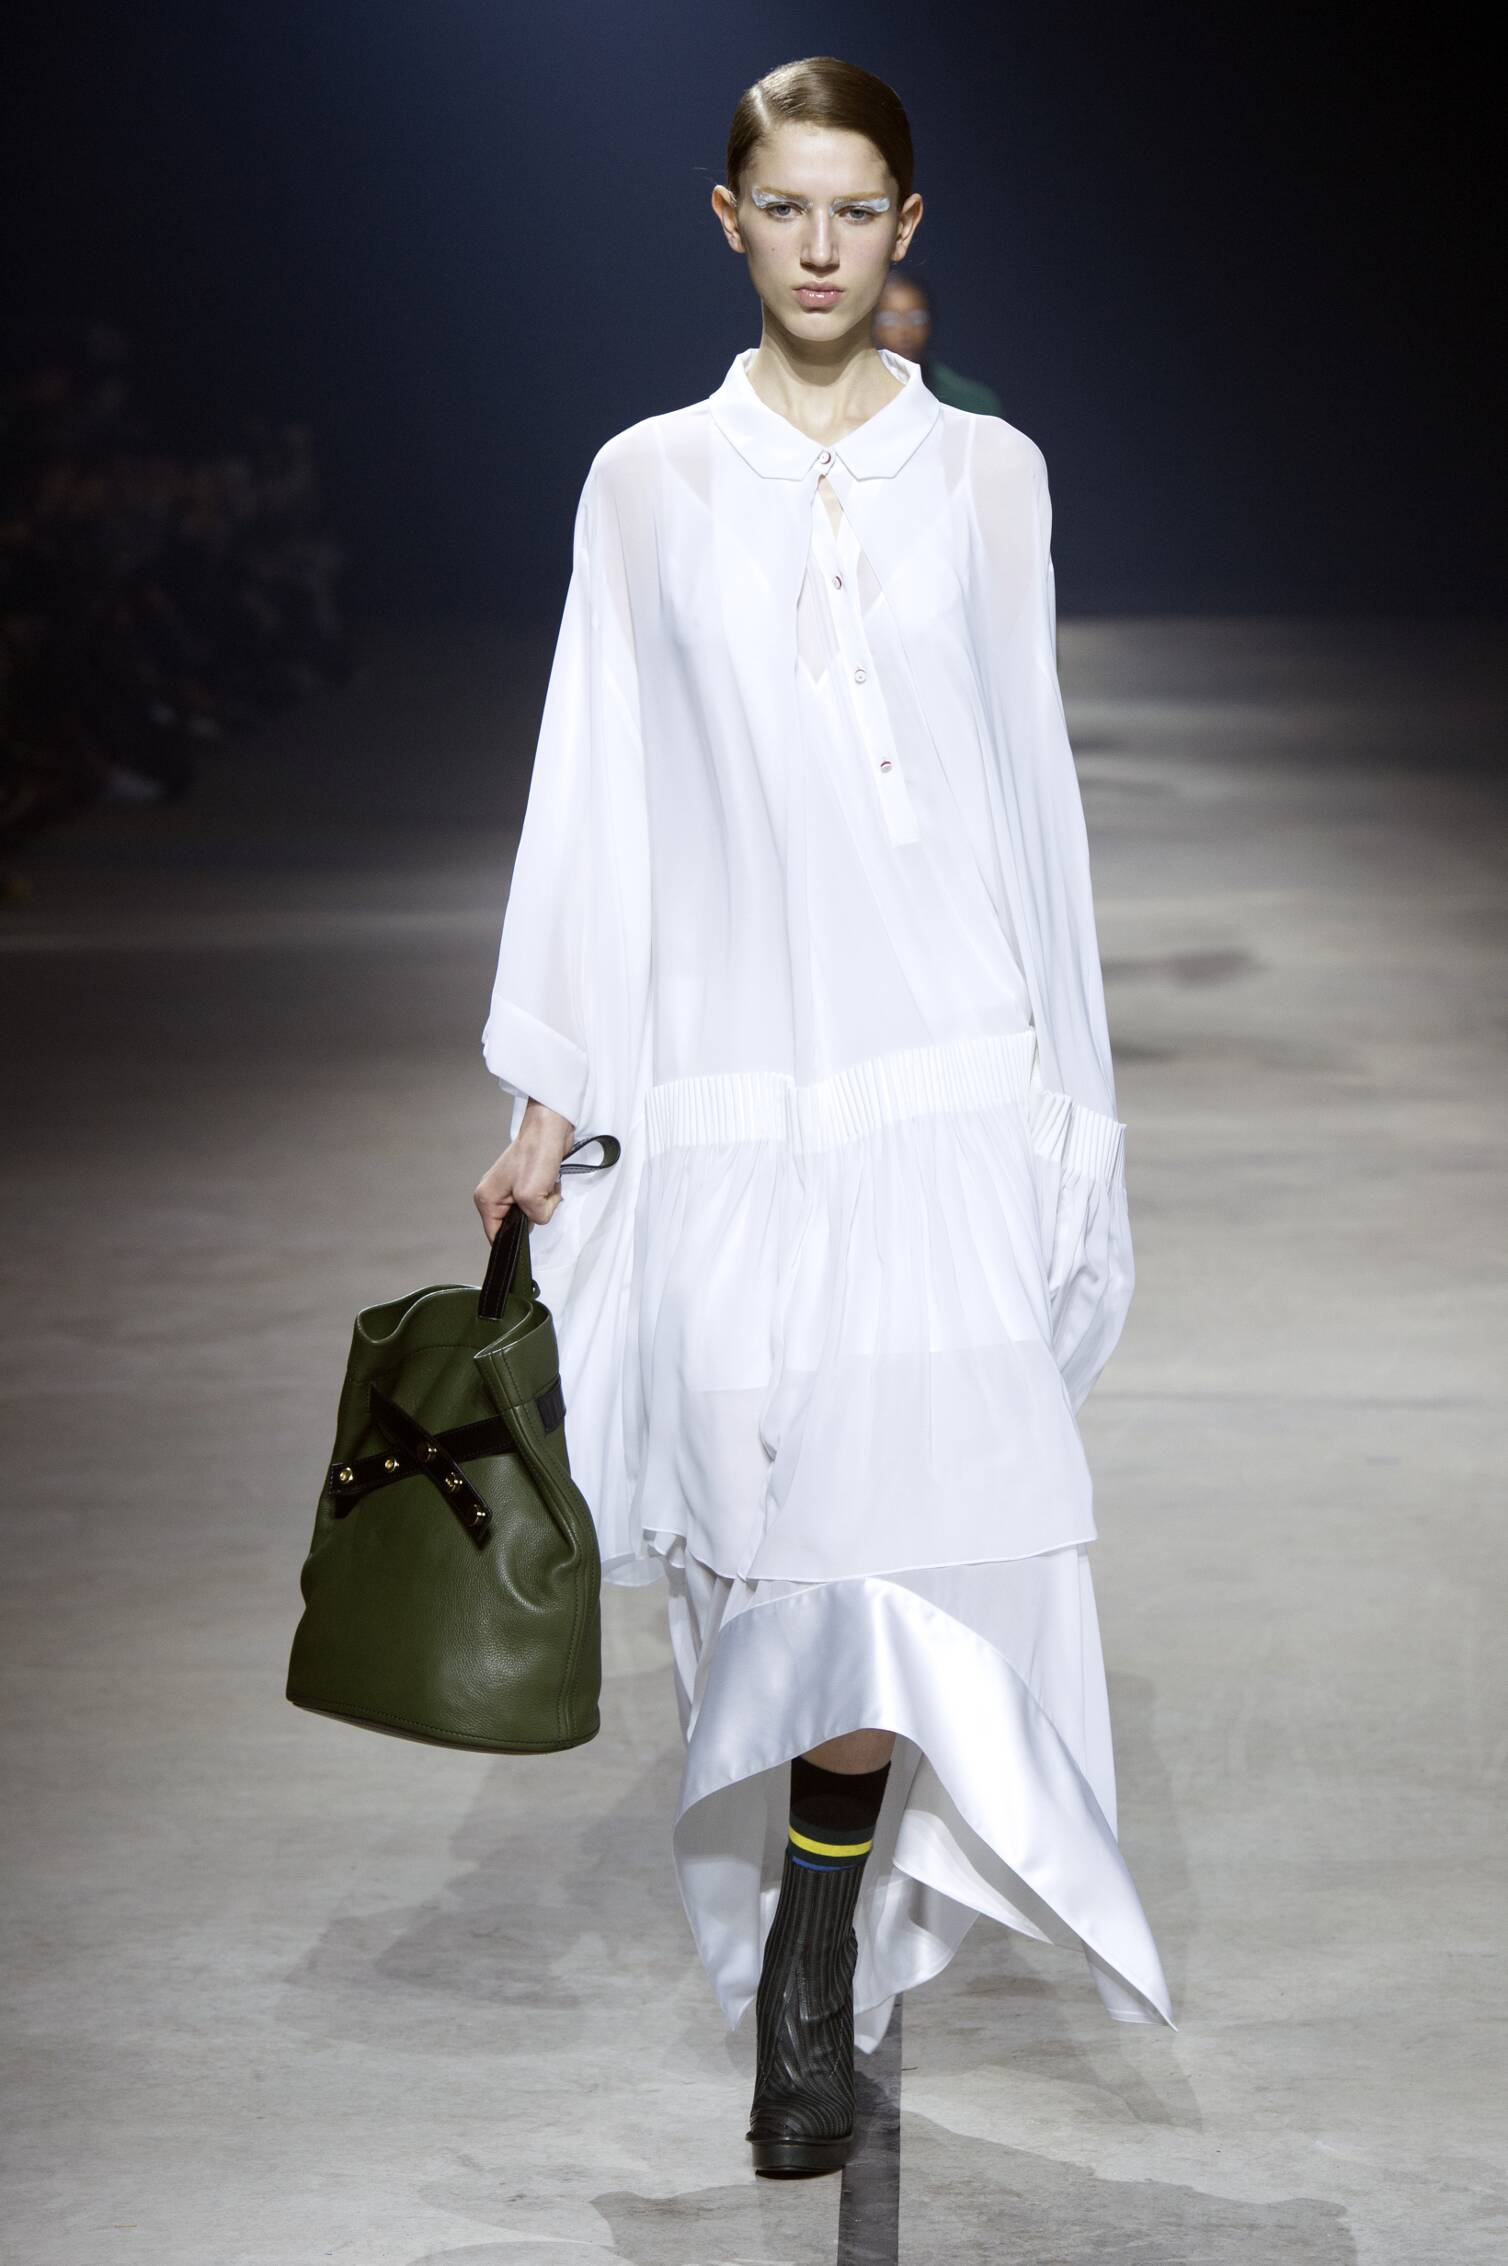 Catwalk Kenzo Fall Winter 2015 16 Women's Collection Paris Fashion Week